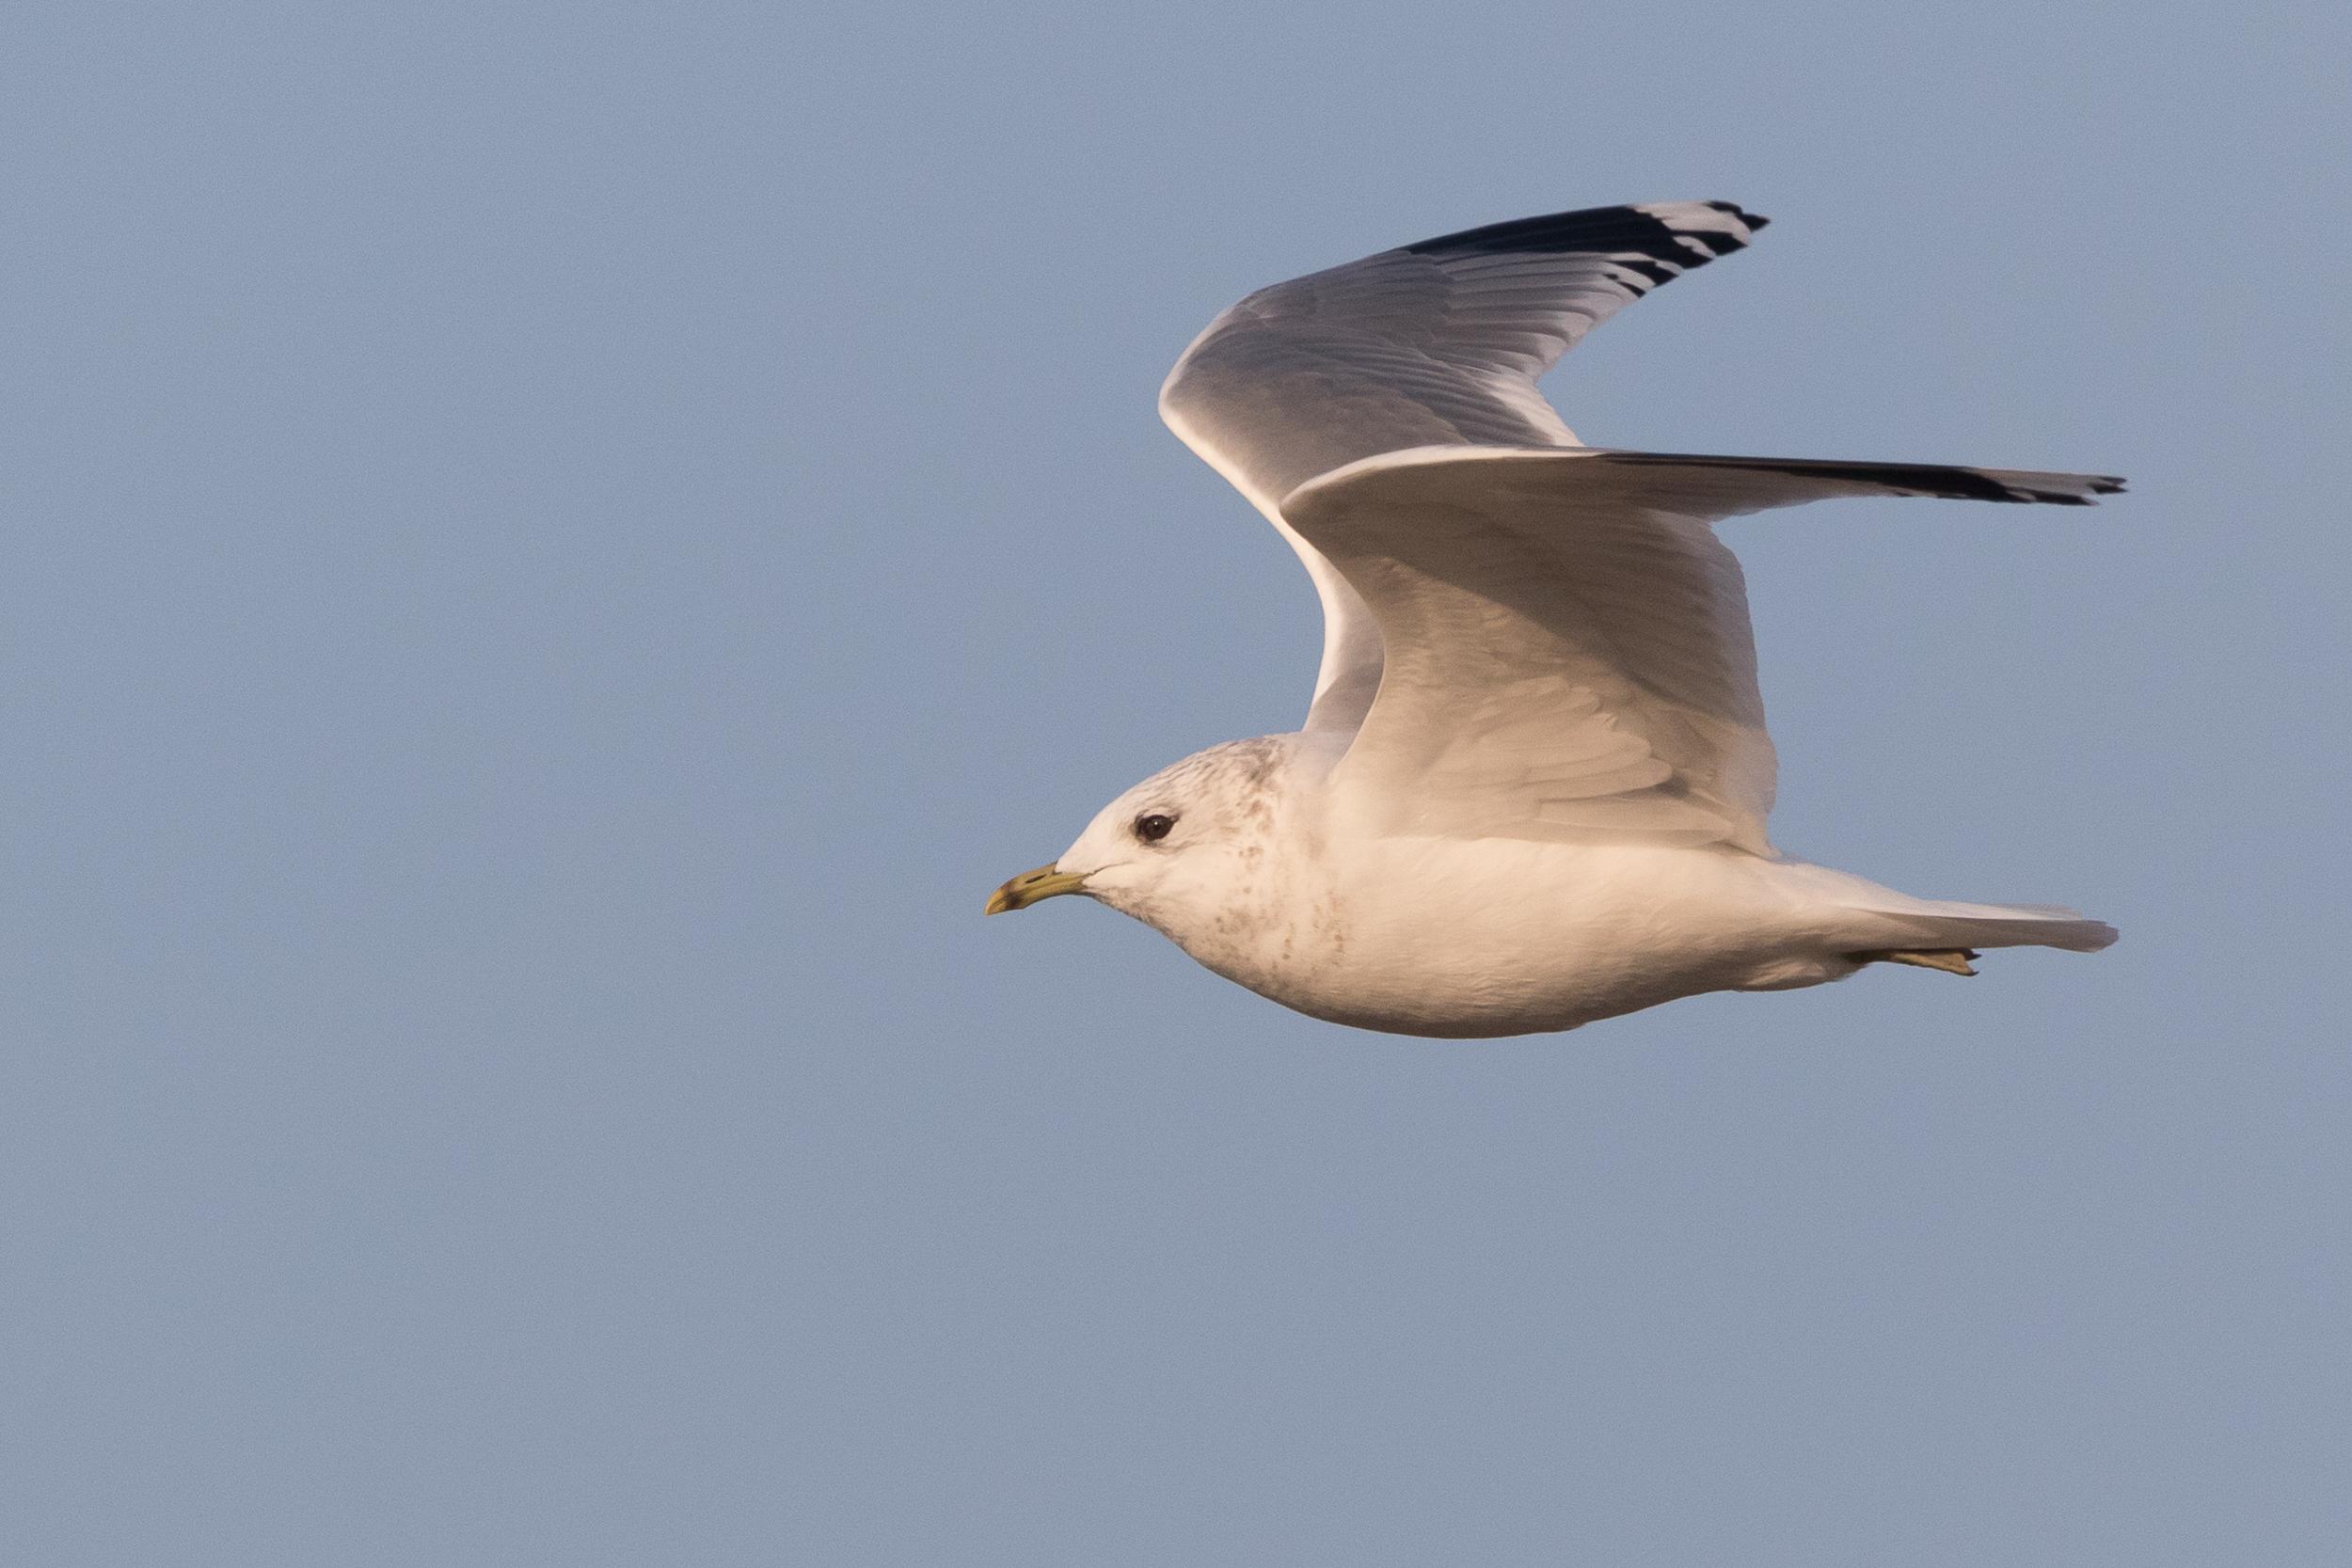 20170126-Common Gull Adult-155.jpg